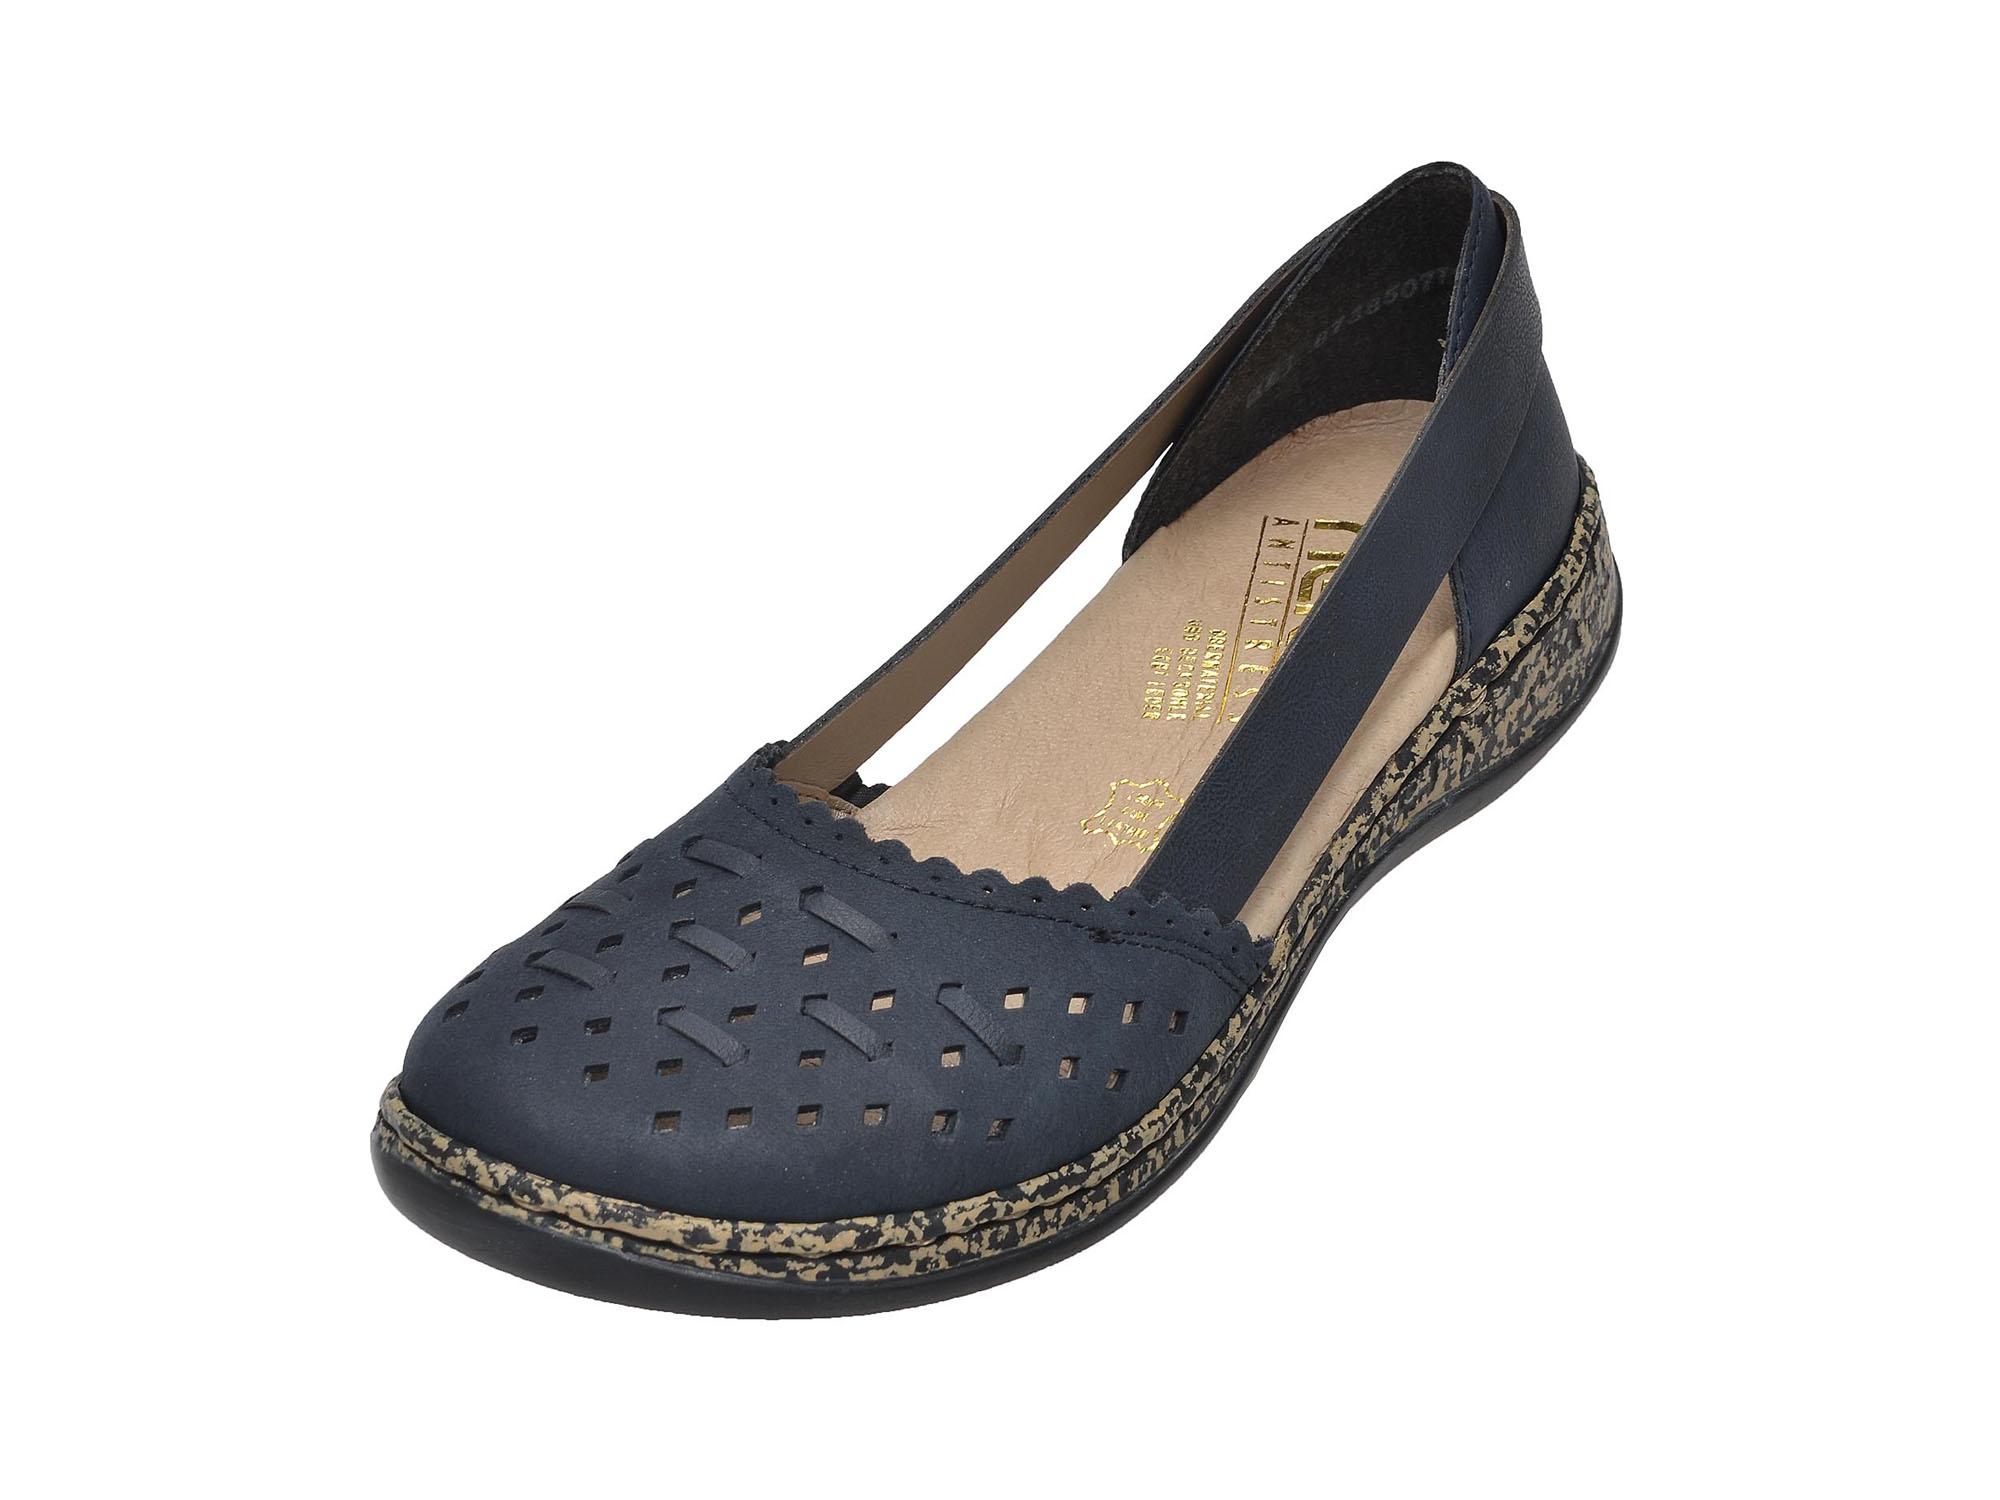 detail Dámská obuv RIEKER 46397 14 BLAU F S 8 f336aa5c412